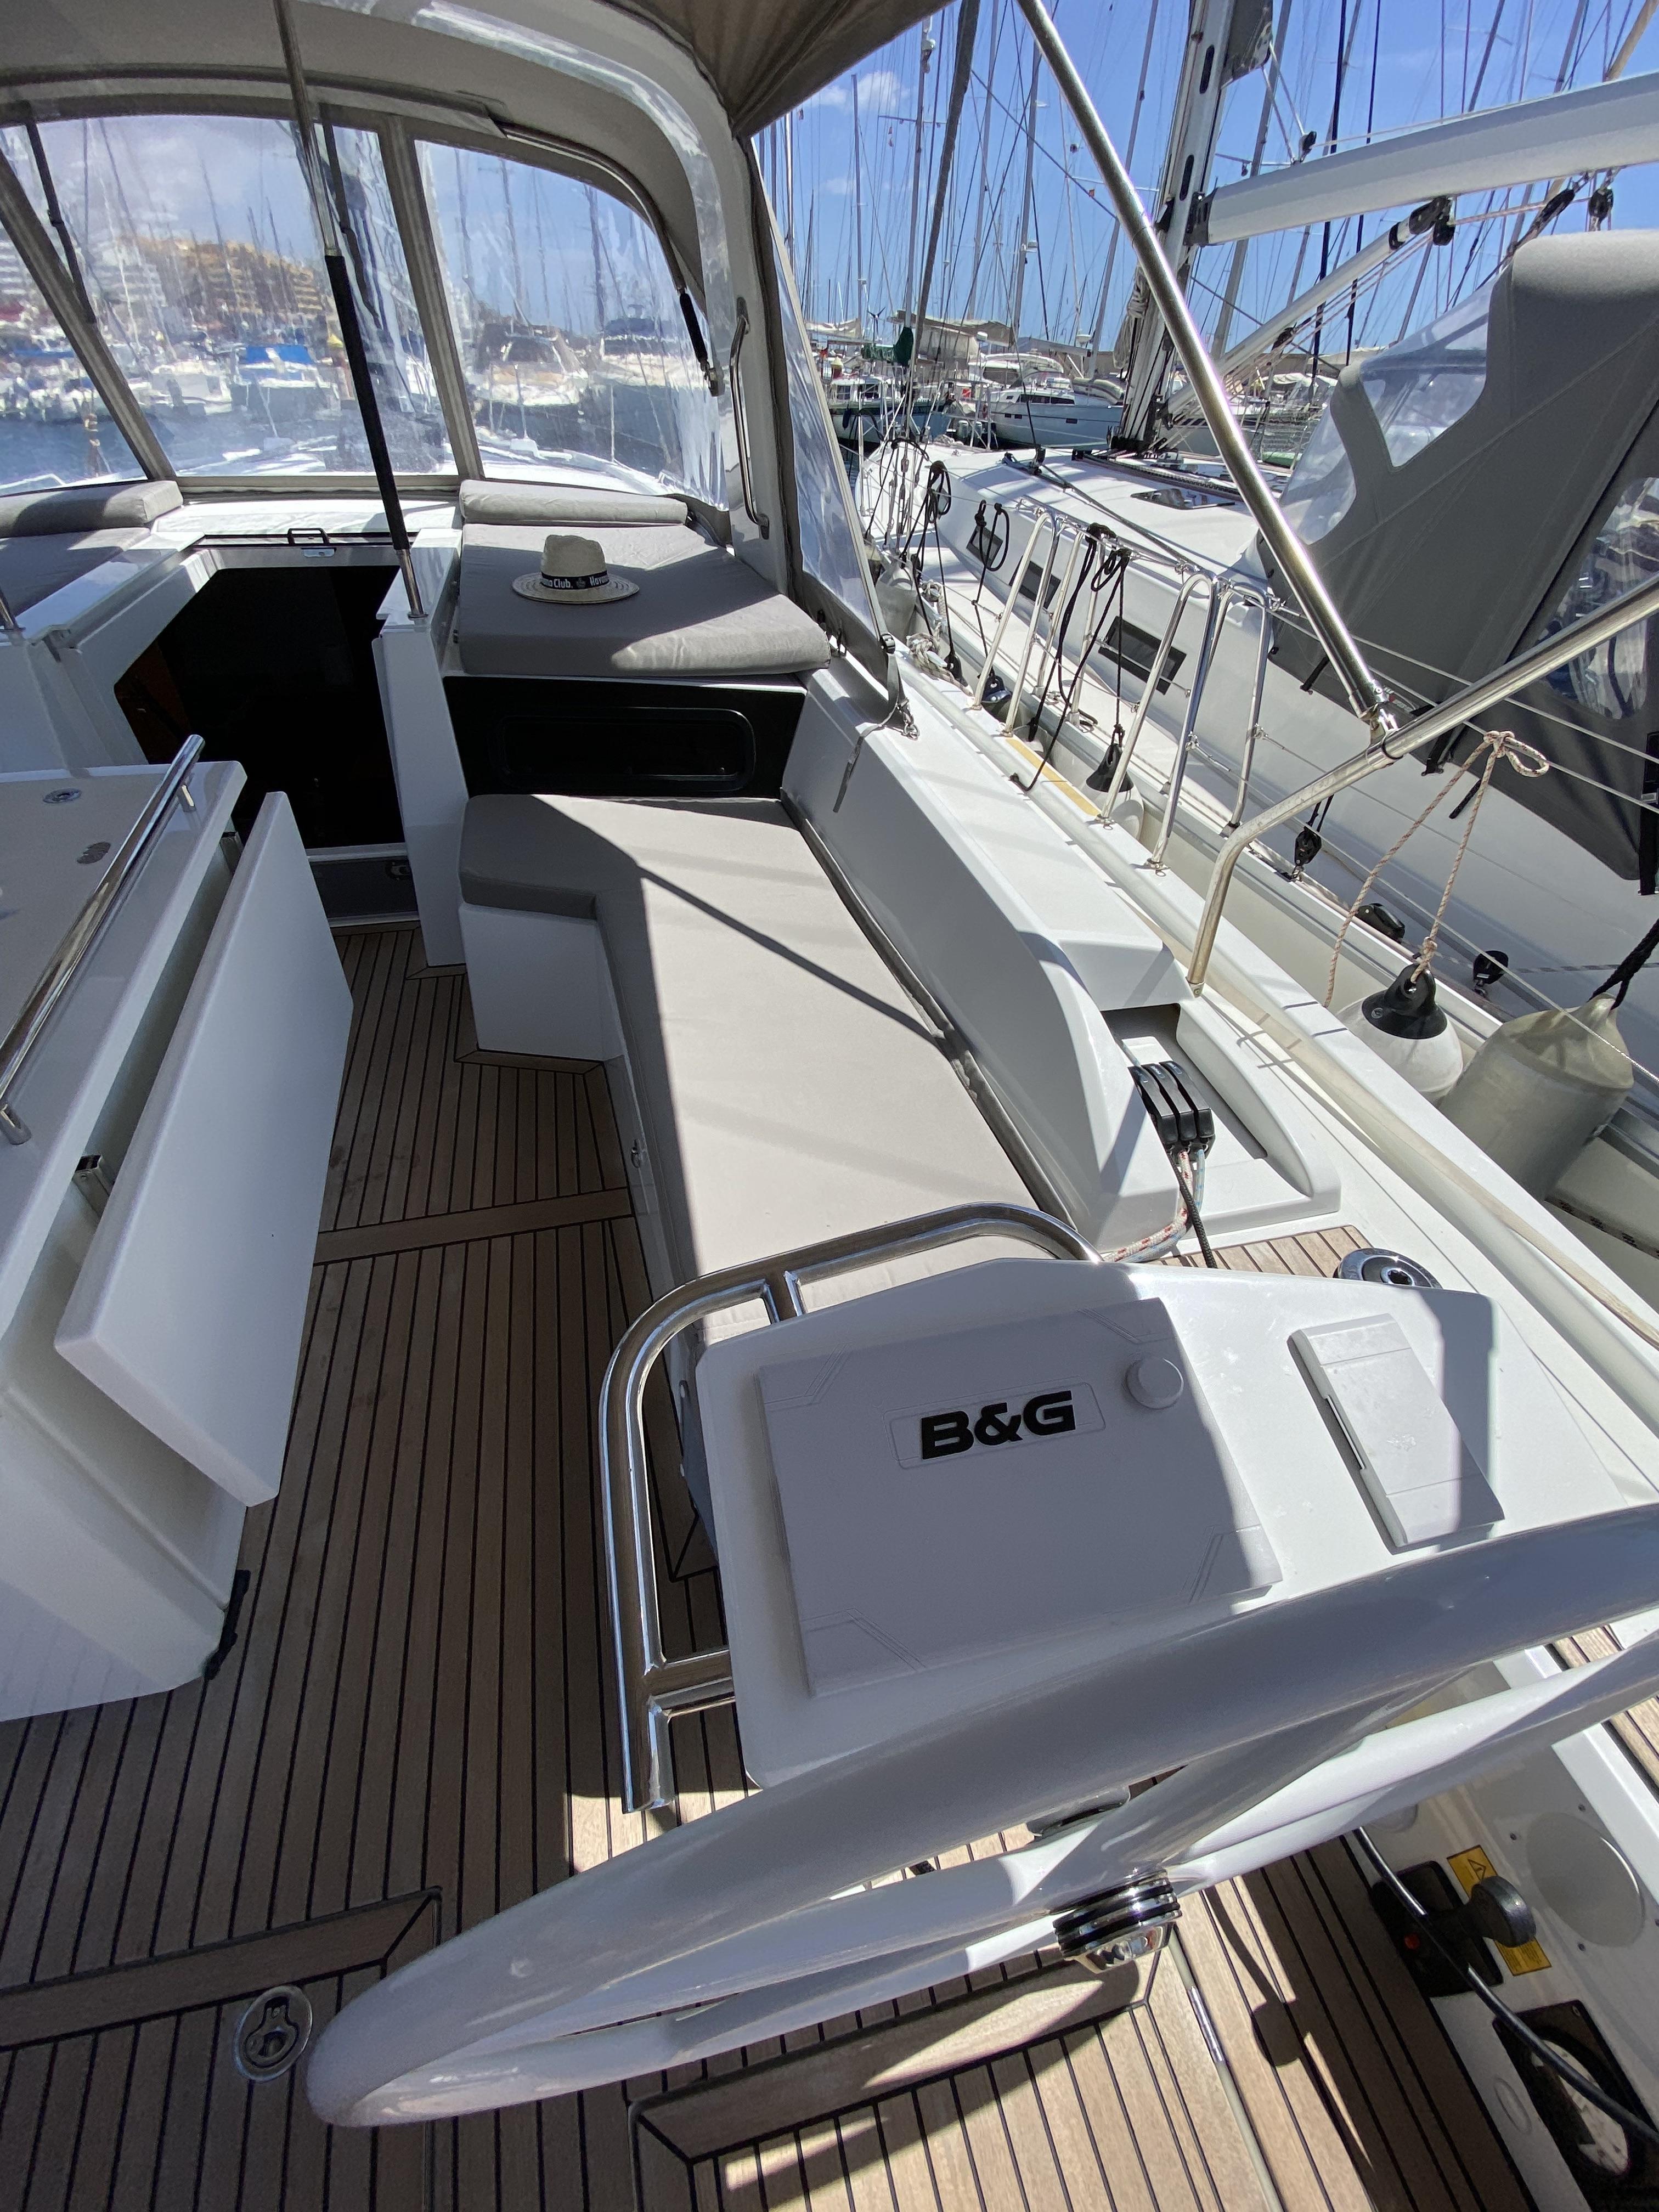 BAREBOAT CHARTER IBIZA SAILING HOLIDAY VACATION RENTALS OCEANIS 46.1 BENETEAU IBIZA MALLORCA BALEARI